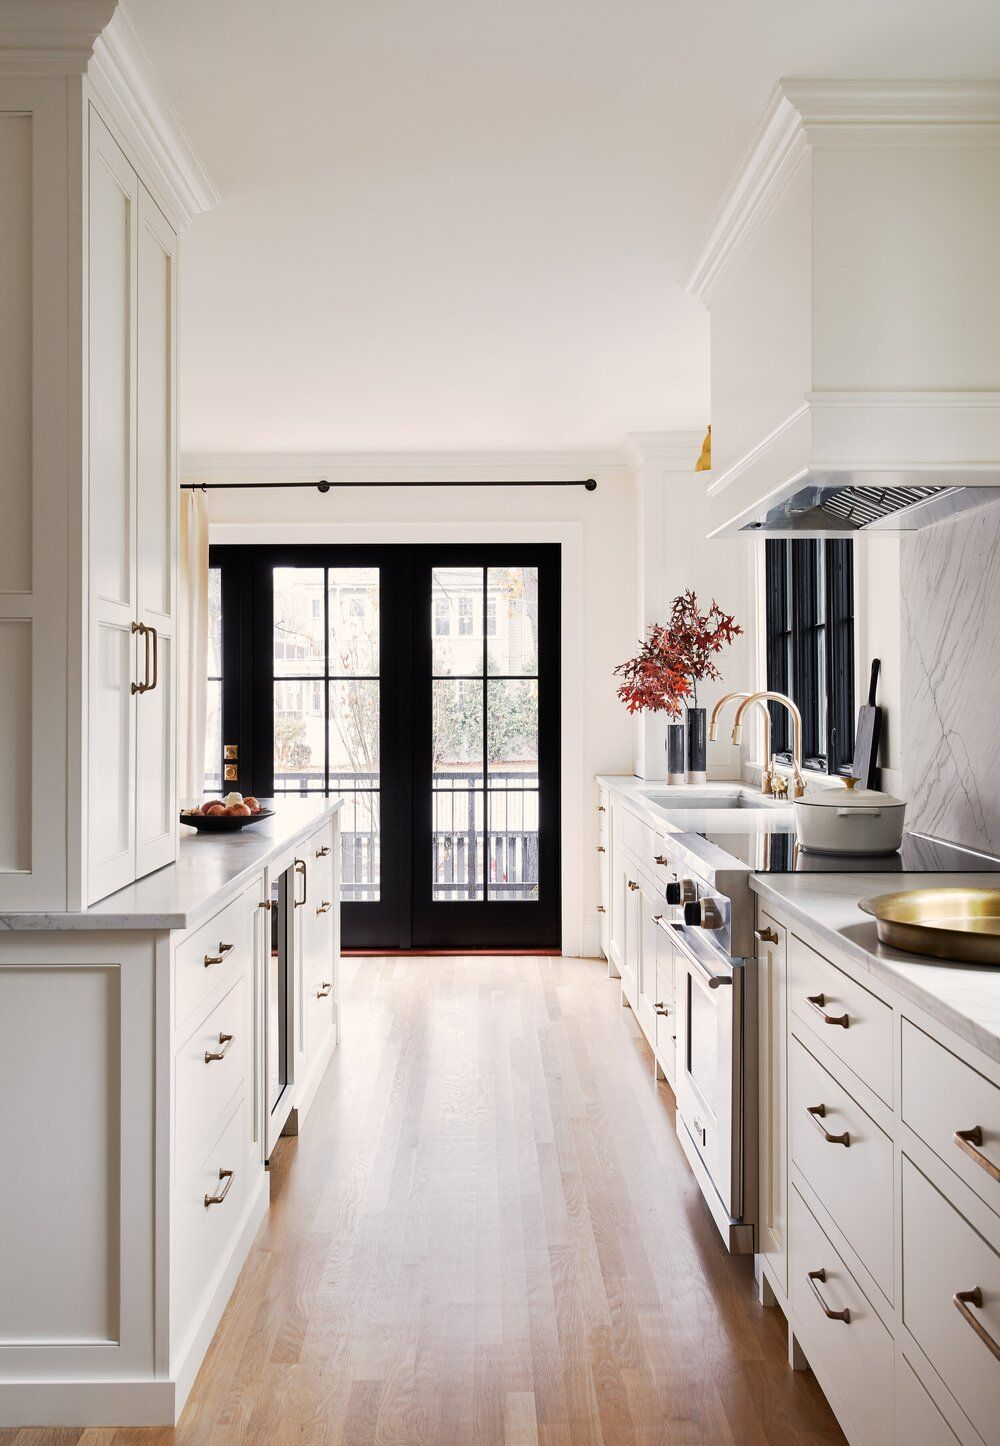 Katie Rosenfeld Company Jamaica Plain Boston Massachusetts In 2020 Home Remodeling House Interior Home Decor